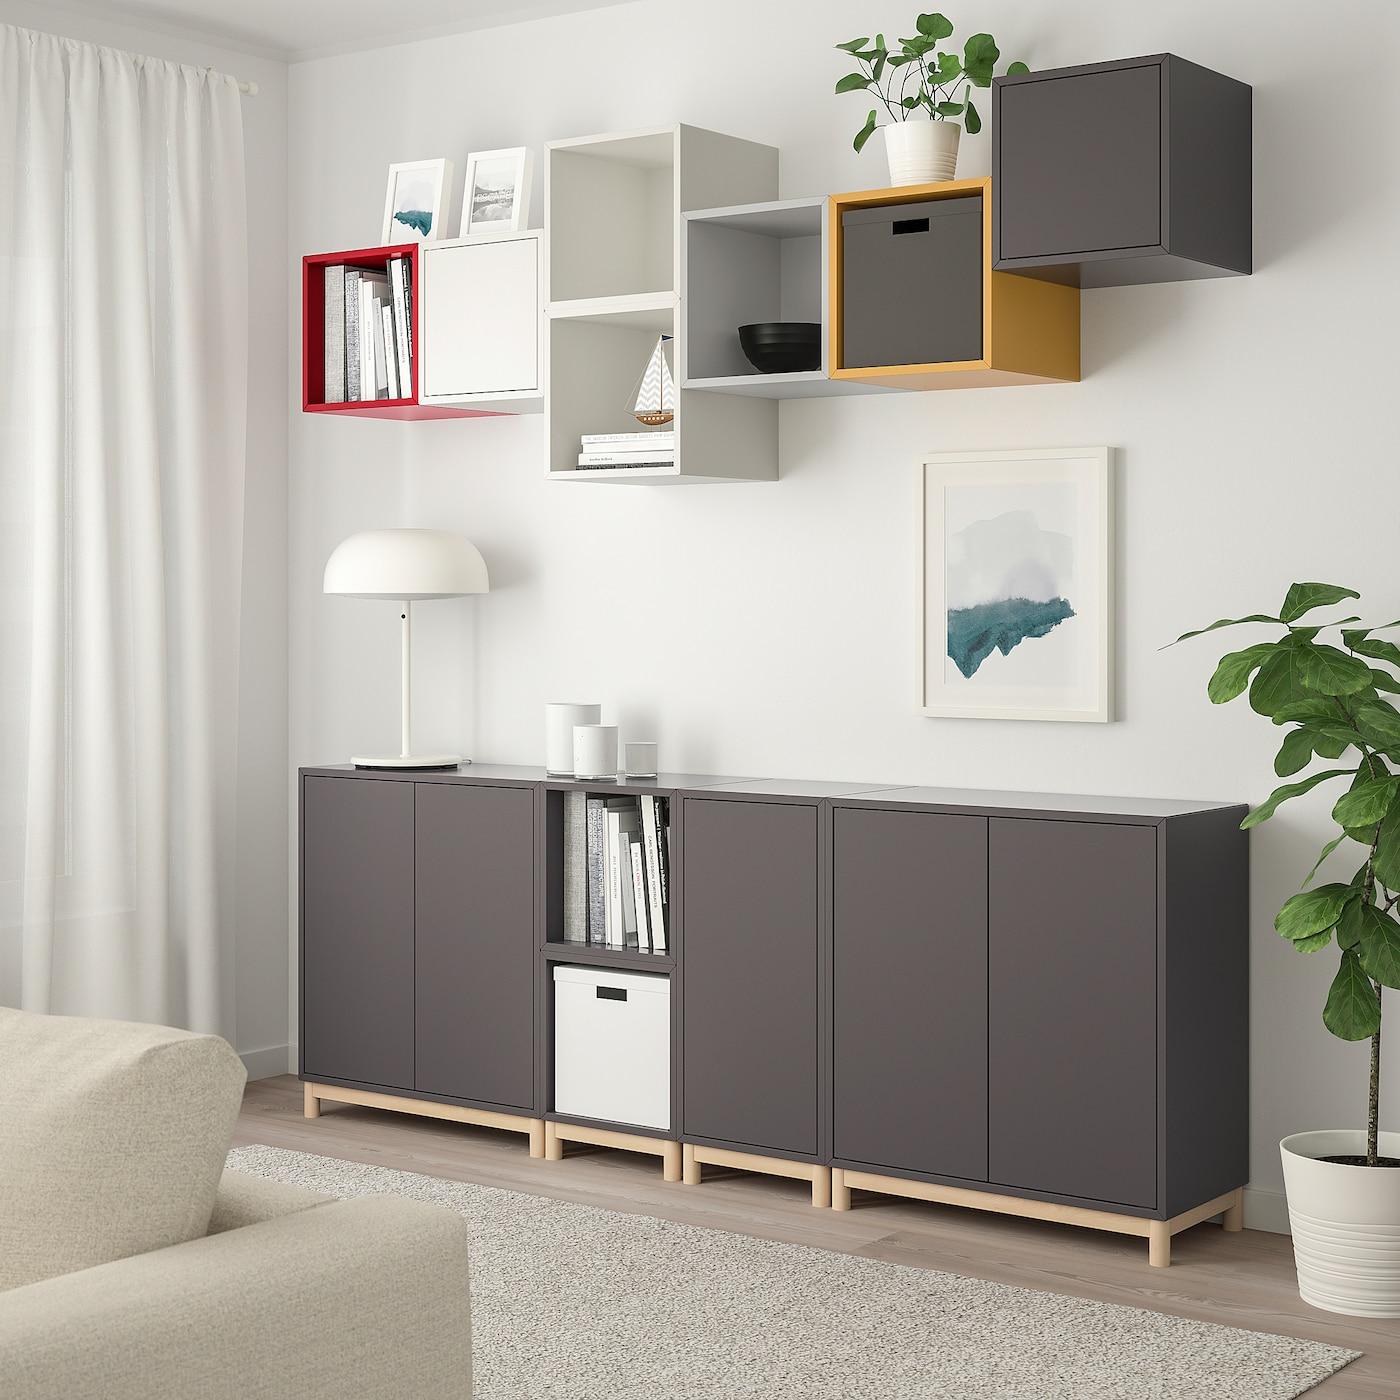 Cabinet Combination With Legs Eket Multicolour 1